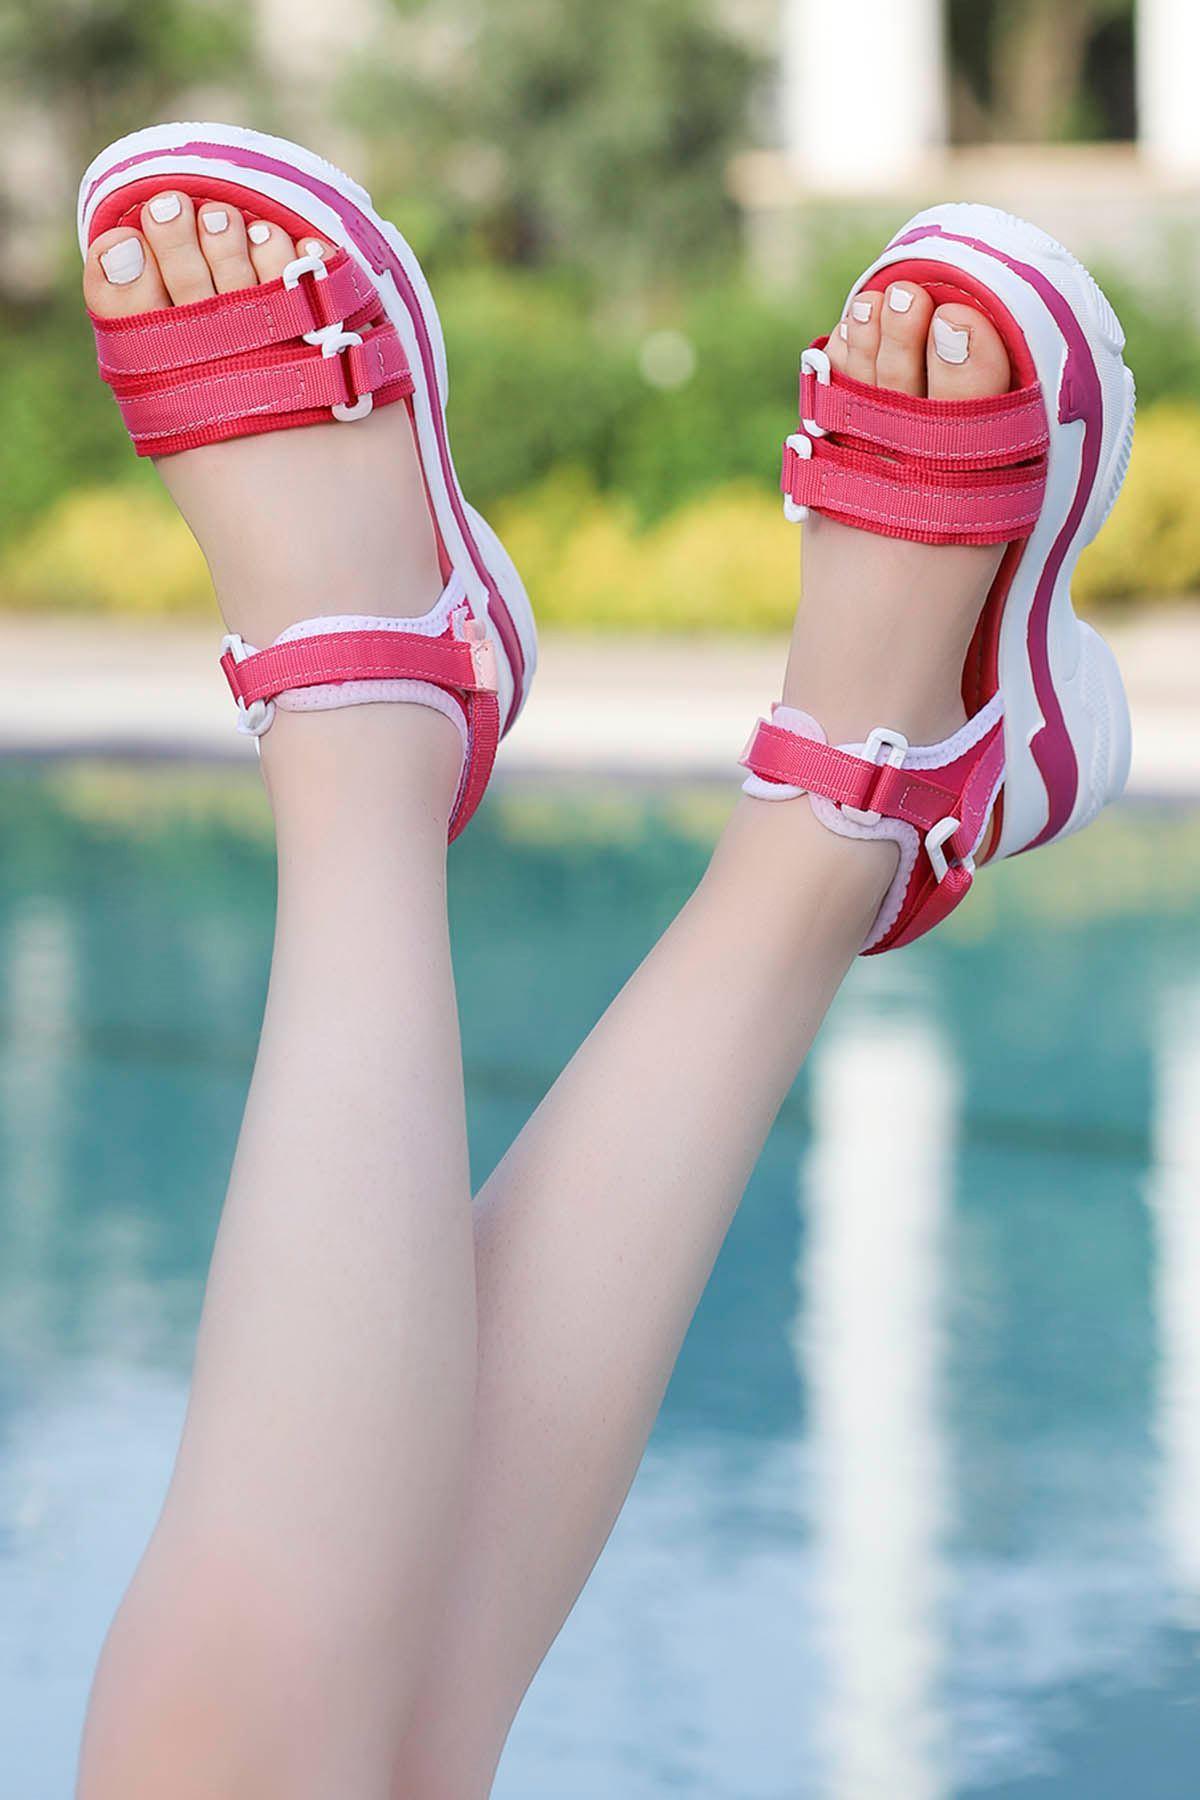 Hooly Dolgu Taban Sandalet Fuşya